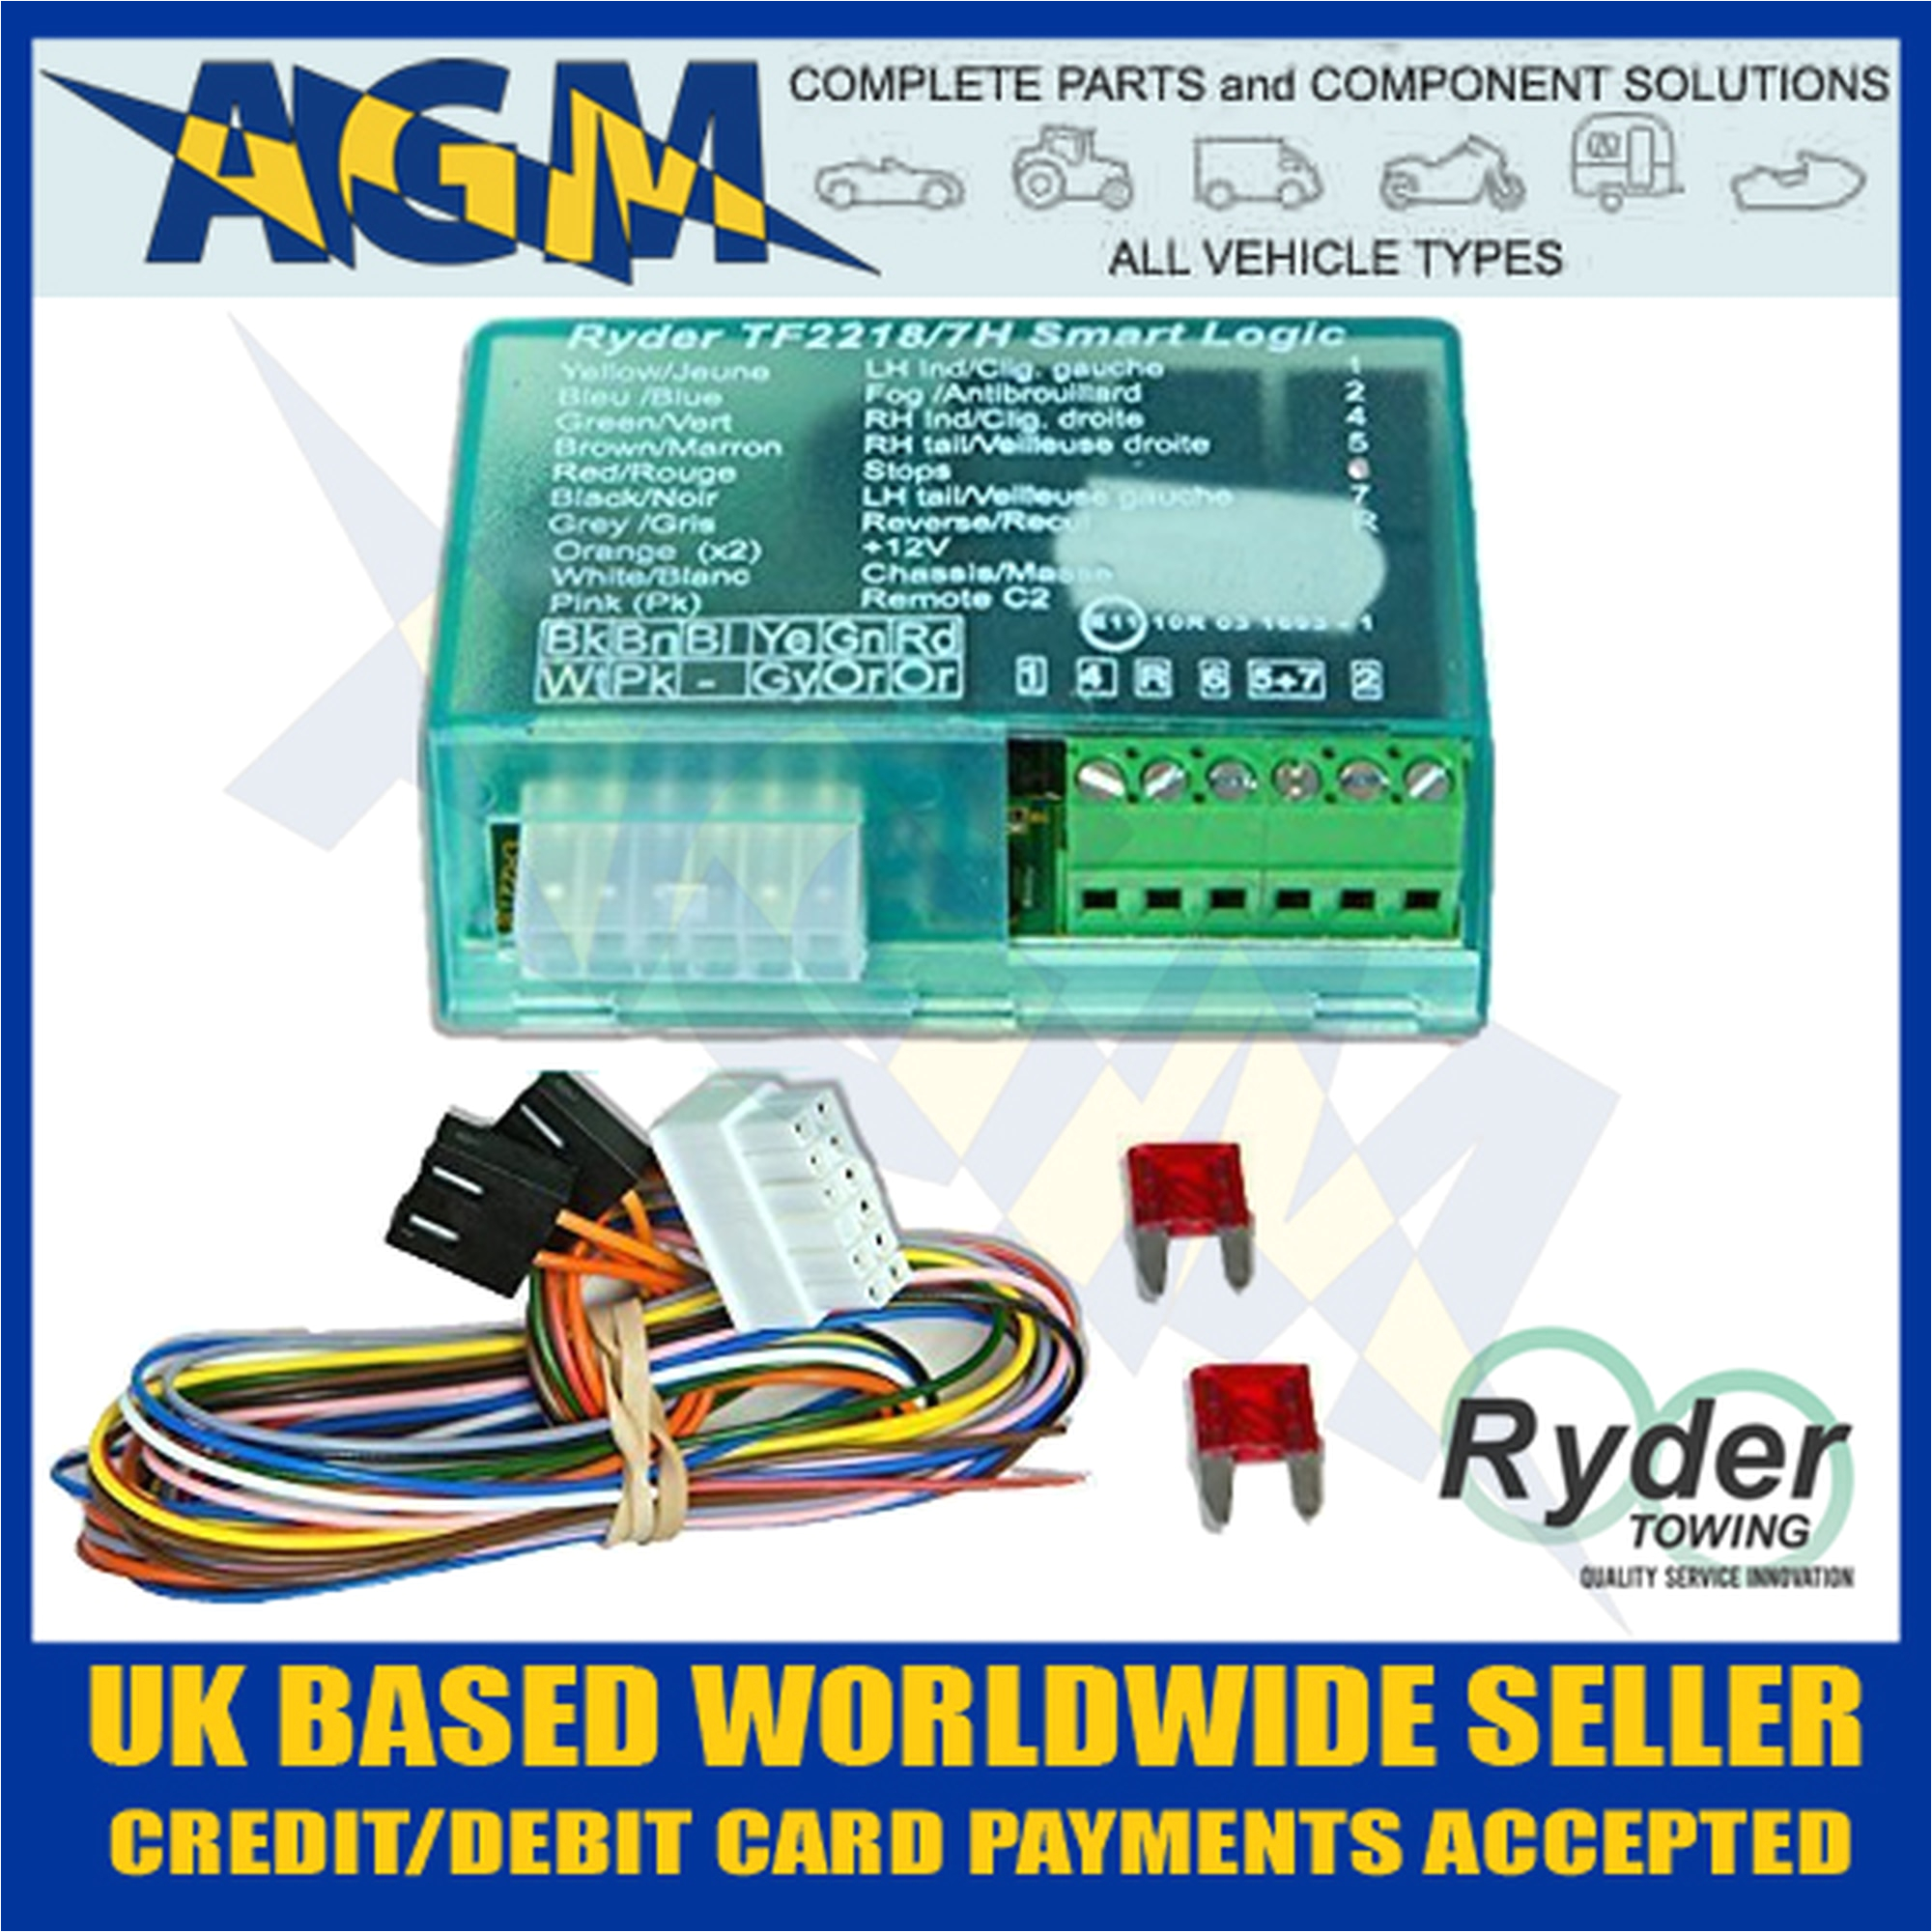 ryder smart logic bypass relay tf2218 7h can